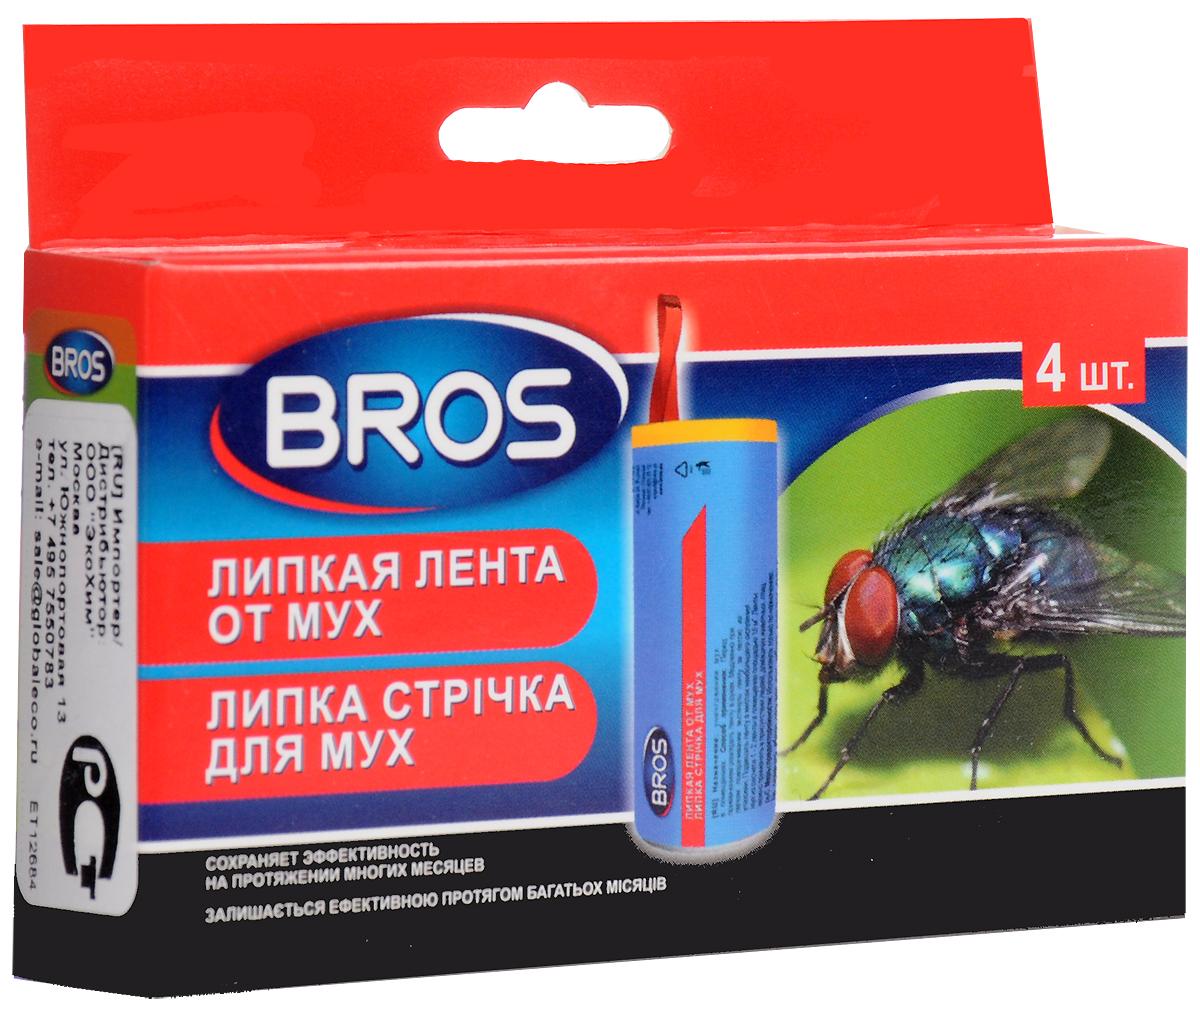 Лента липкая от мух Bros, 4 шт липкая лента bondage tape